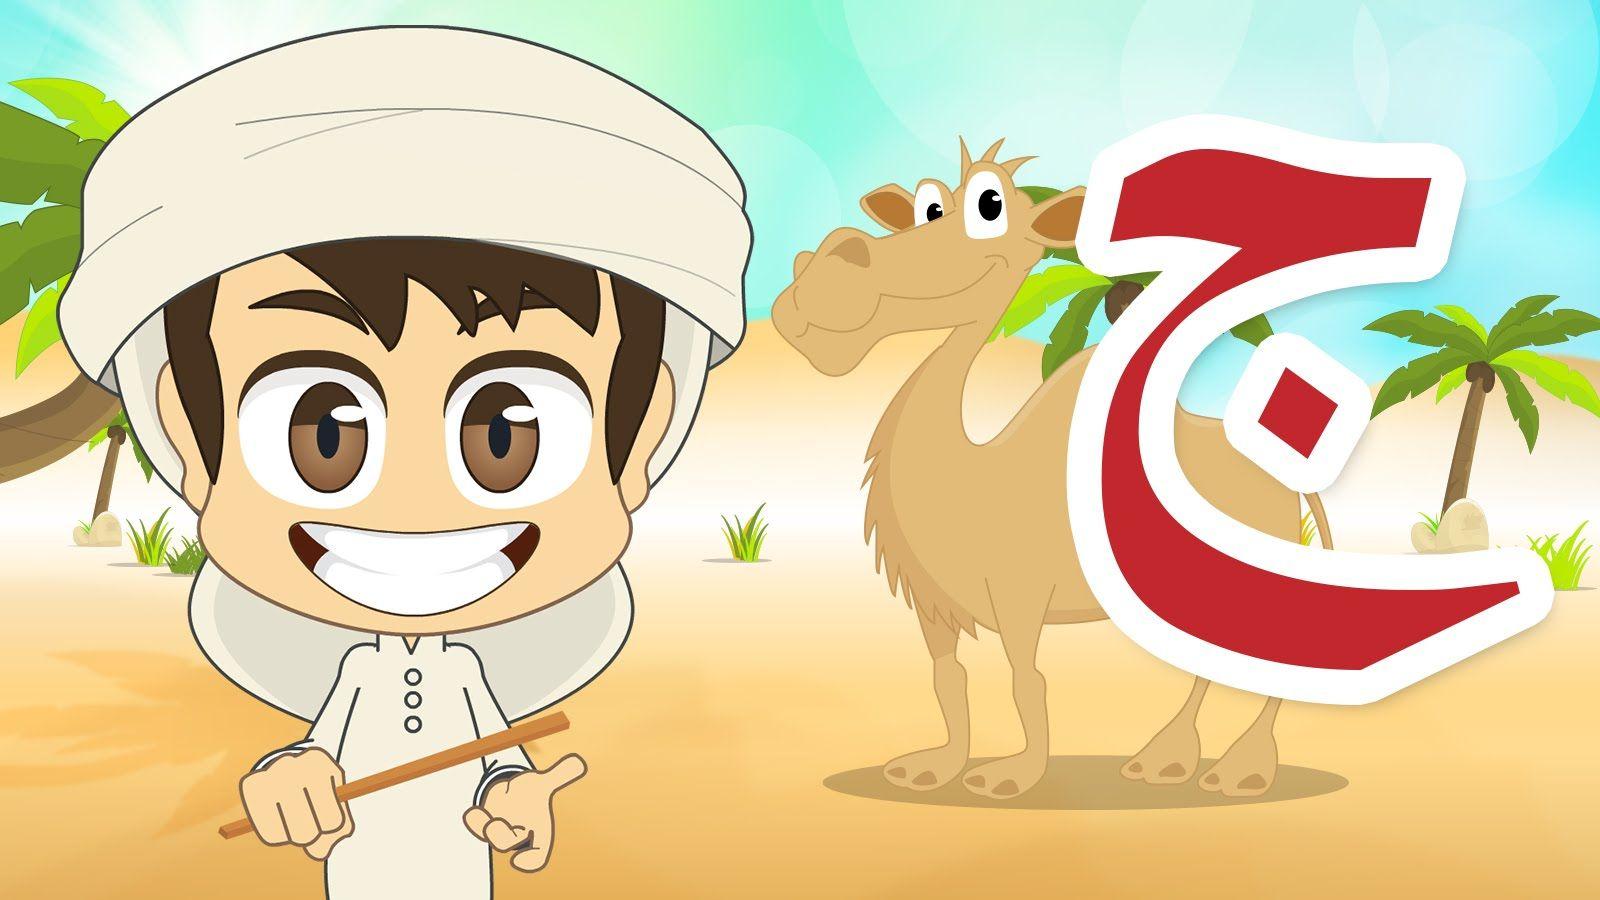 Arabic Letter Jeem ج Arabic Alphabet For Kids حرف الجيم حروف الهجاء للأطفال Alphabet For Kids Arabic Alphabet For Kids Alphabet Preschool